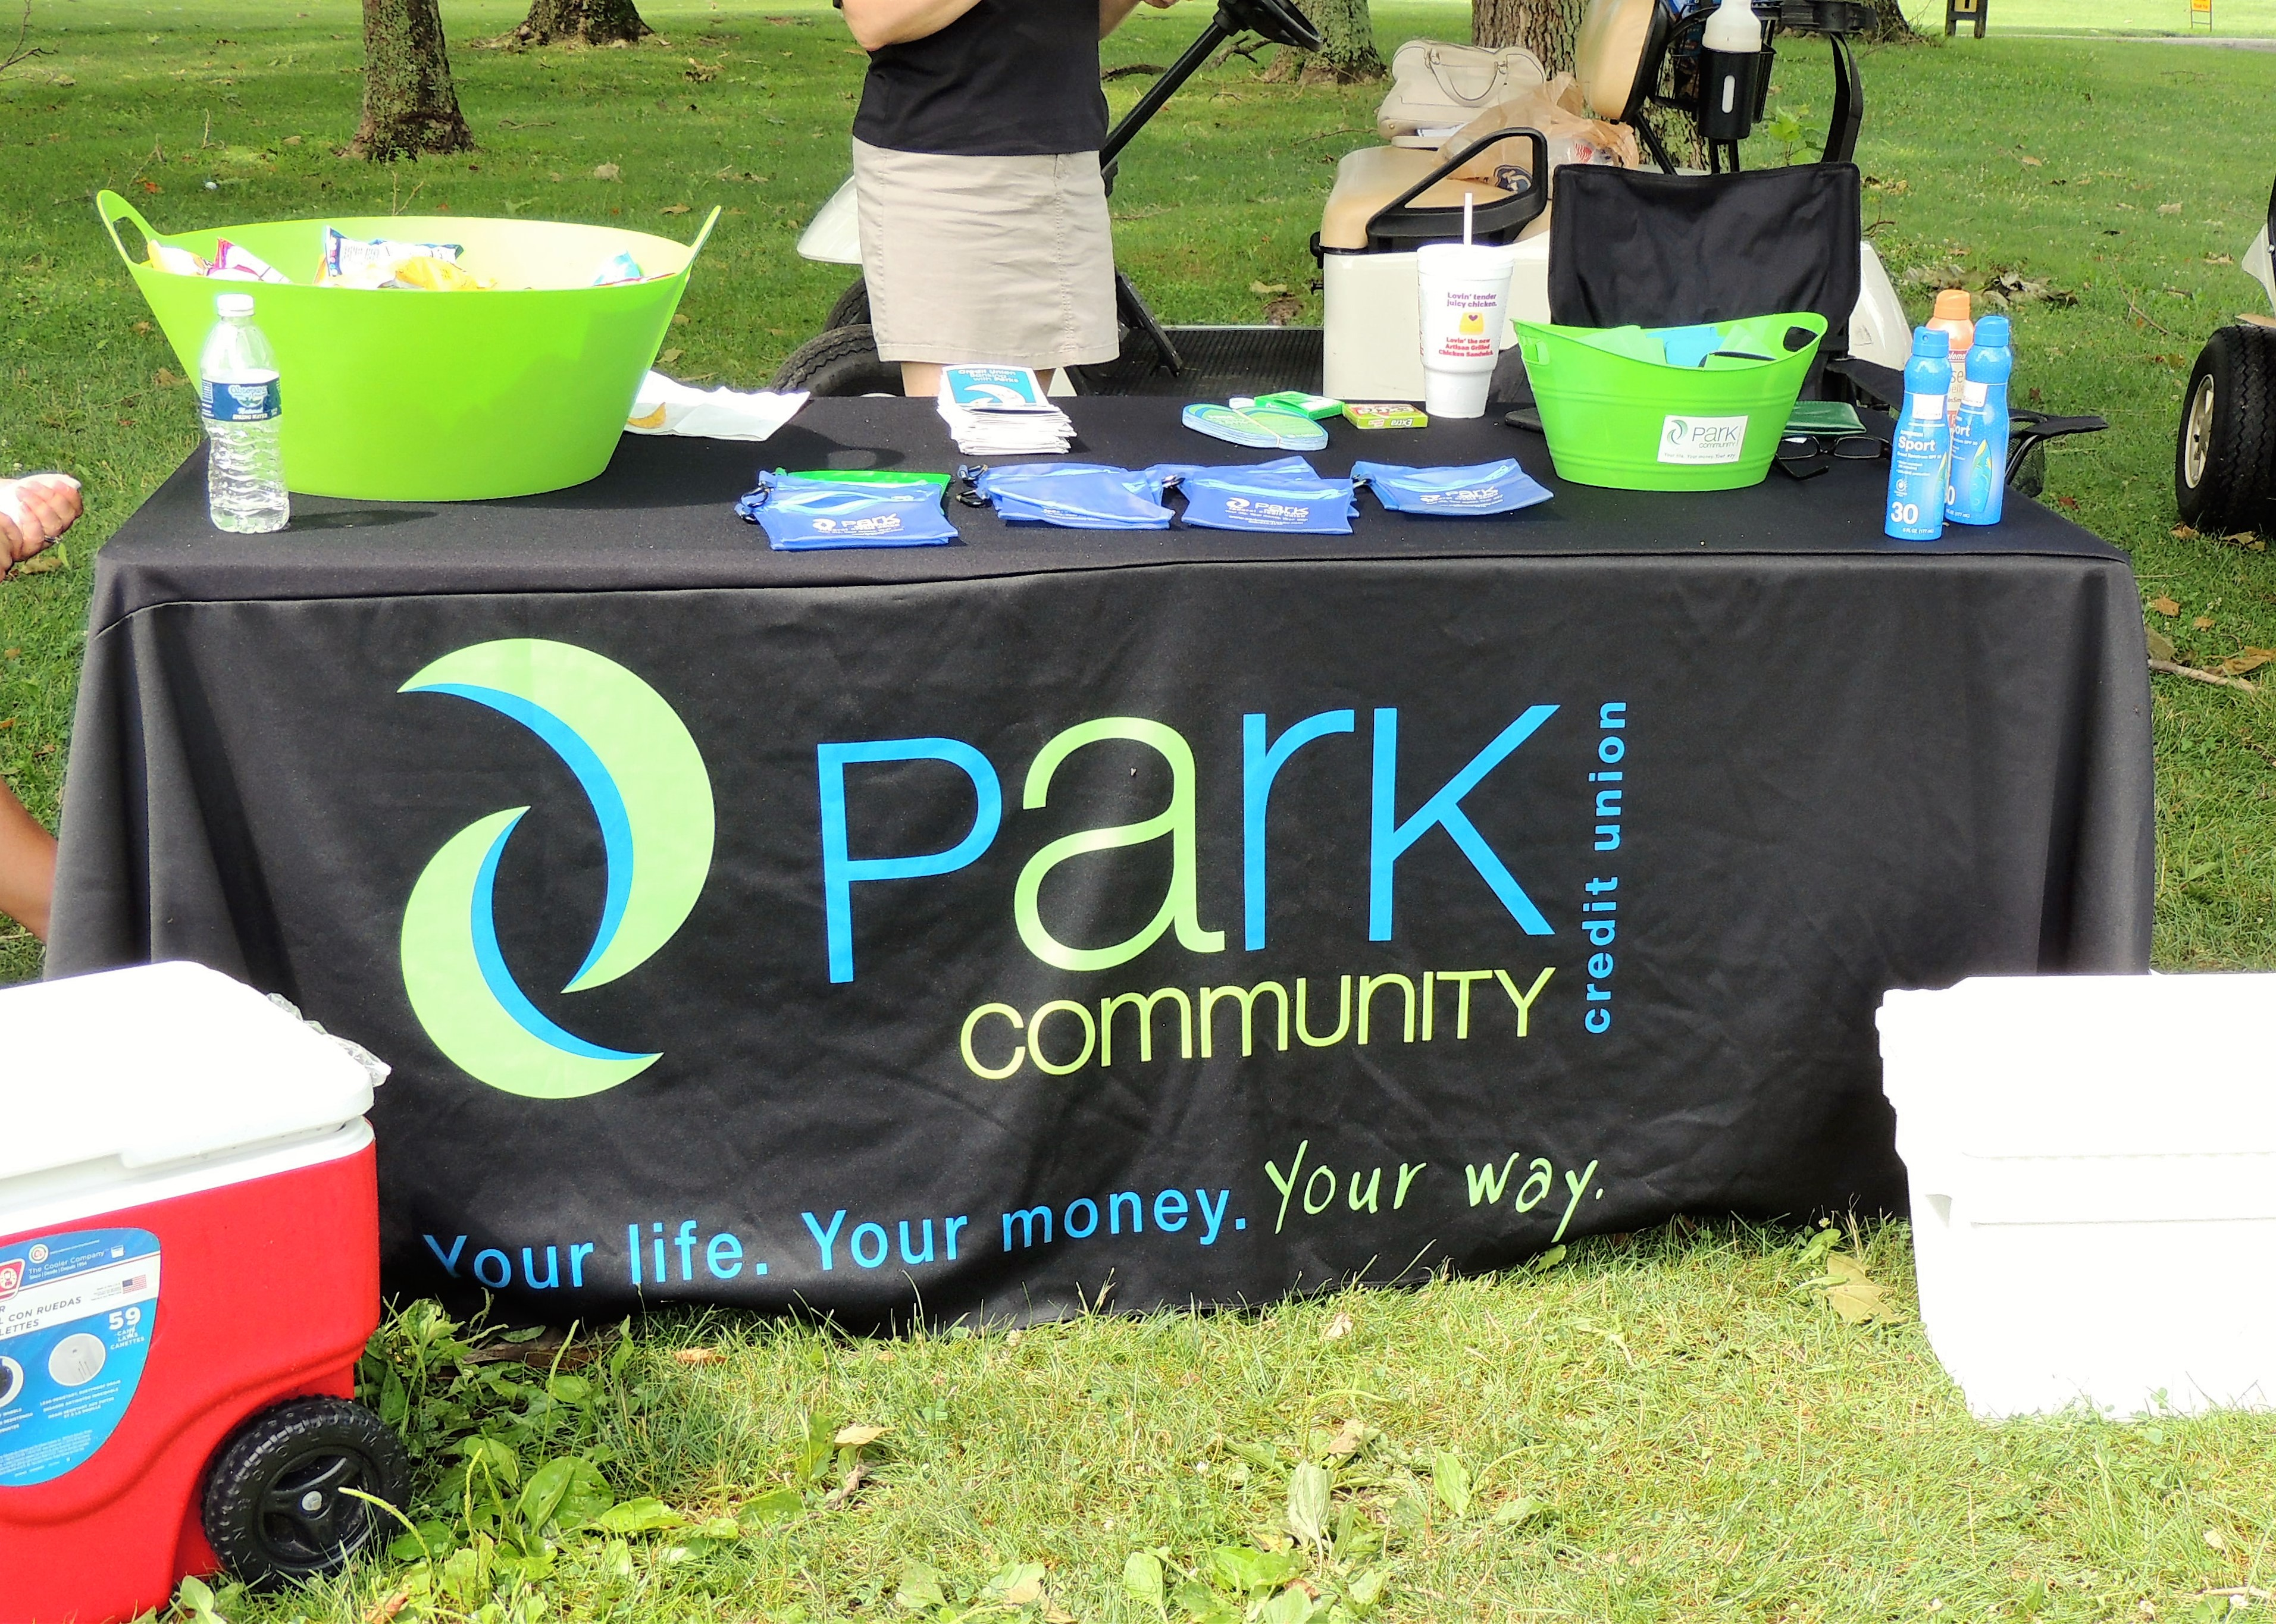 Park_Community.JPG